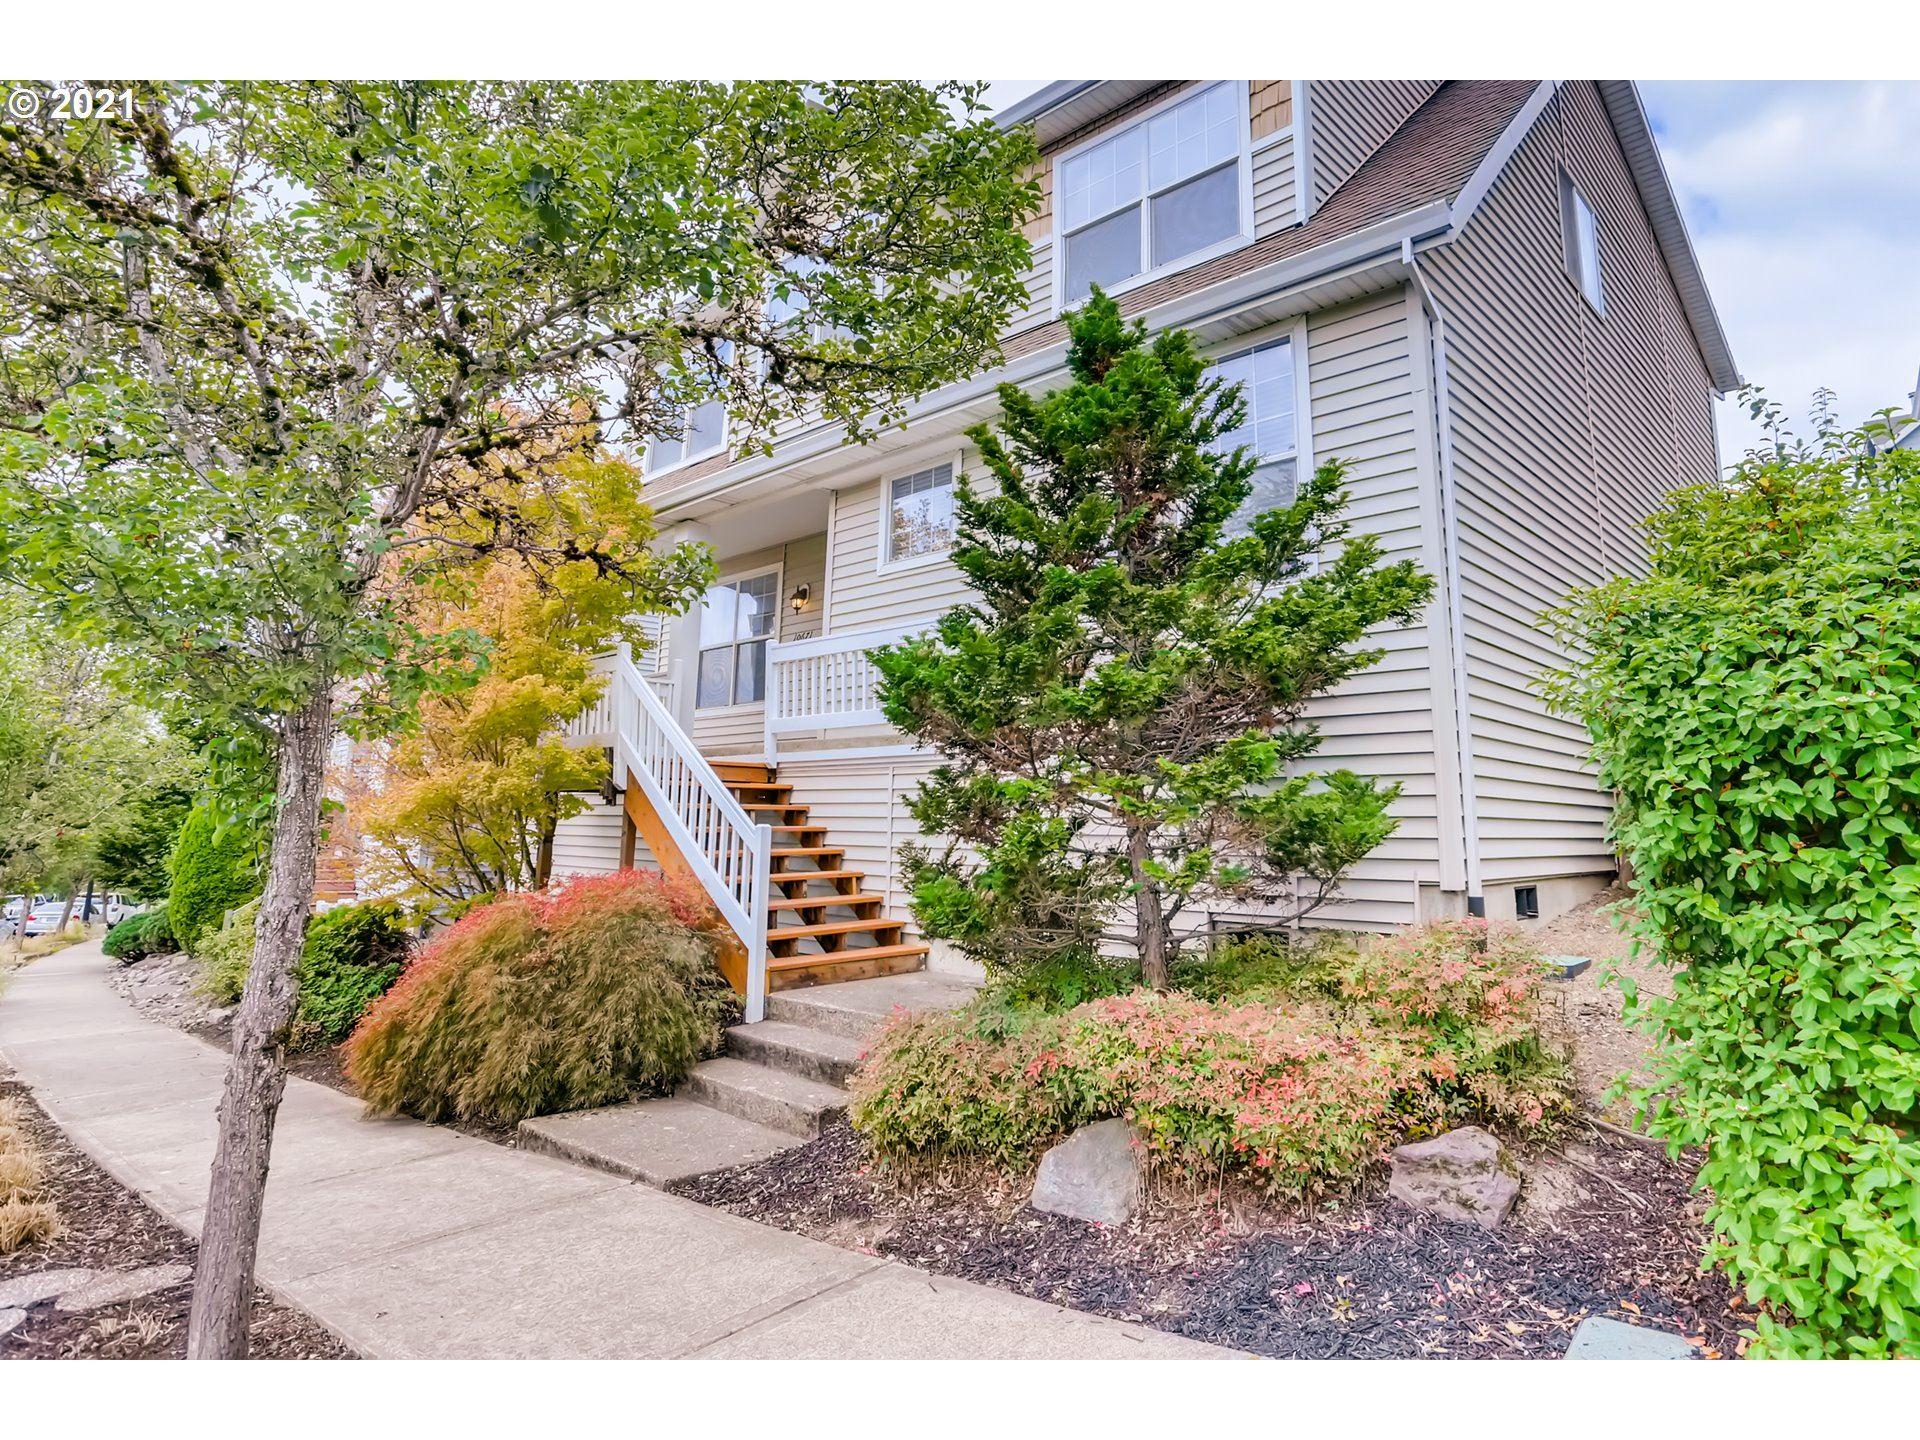 10671 SW WASHINGTON ST, Portland, OR 97225 - MLS#: 21467090